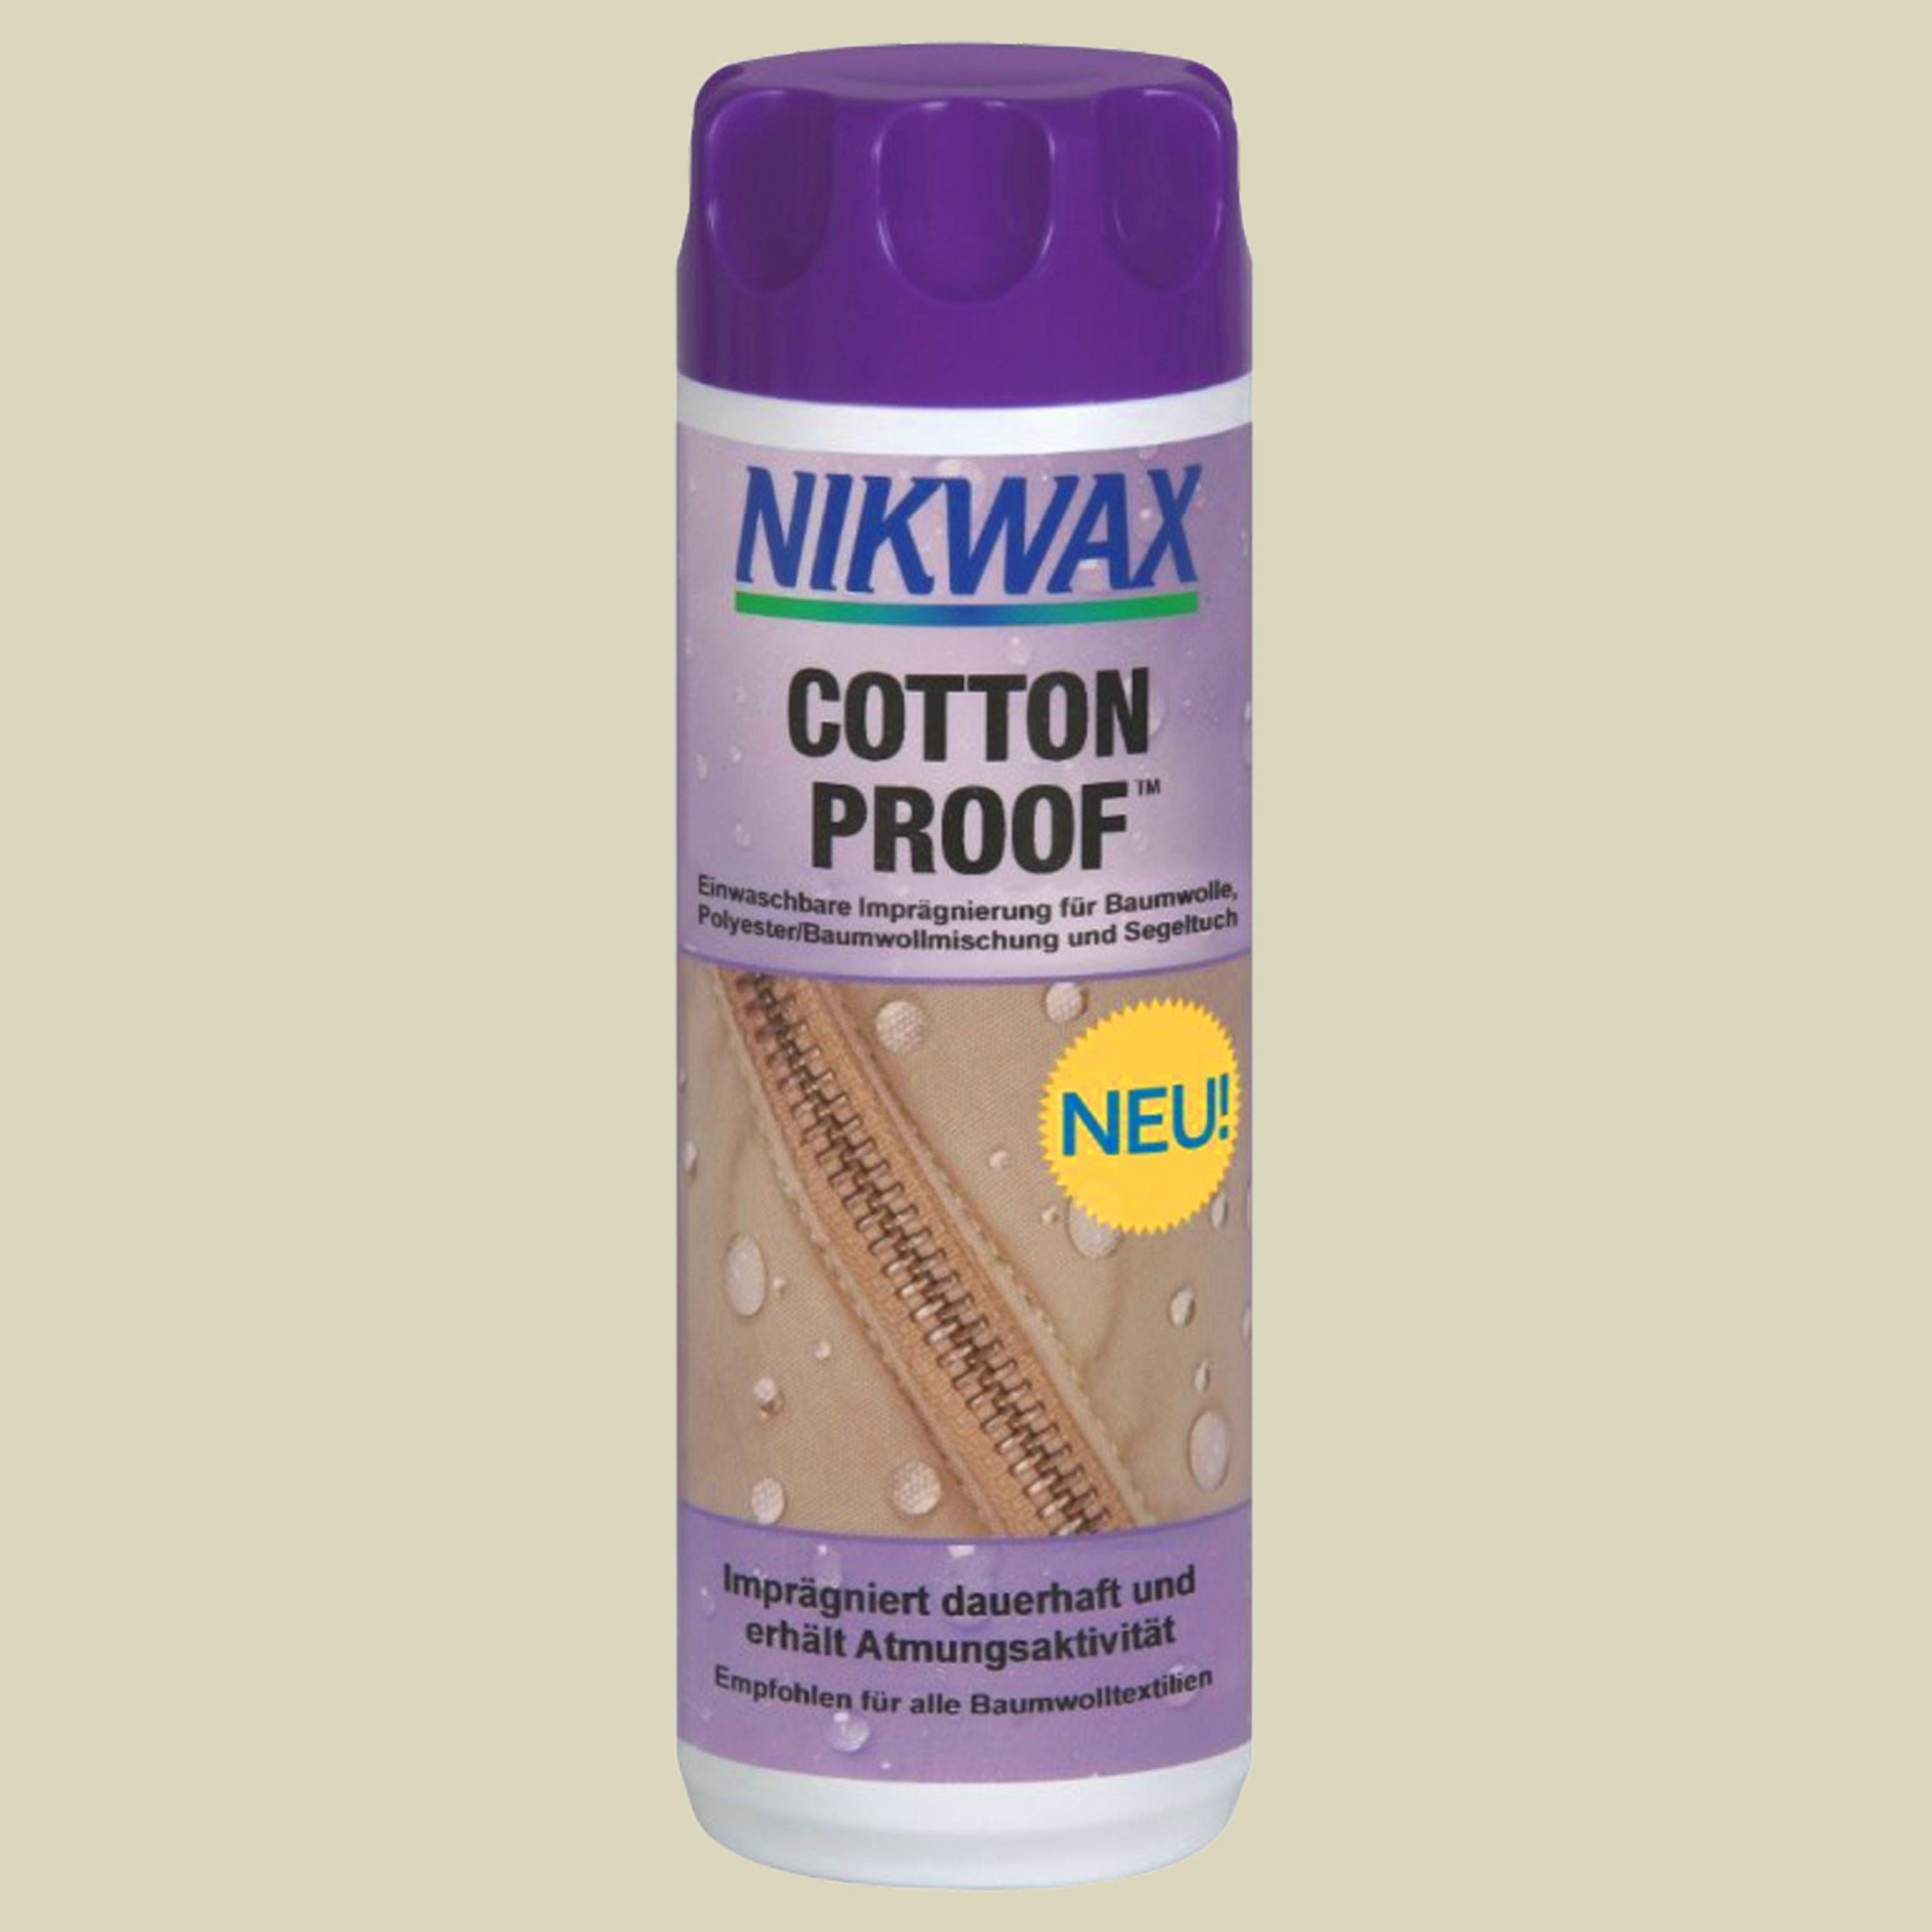 nikwax_cotton_proof_model_261_fallback